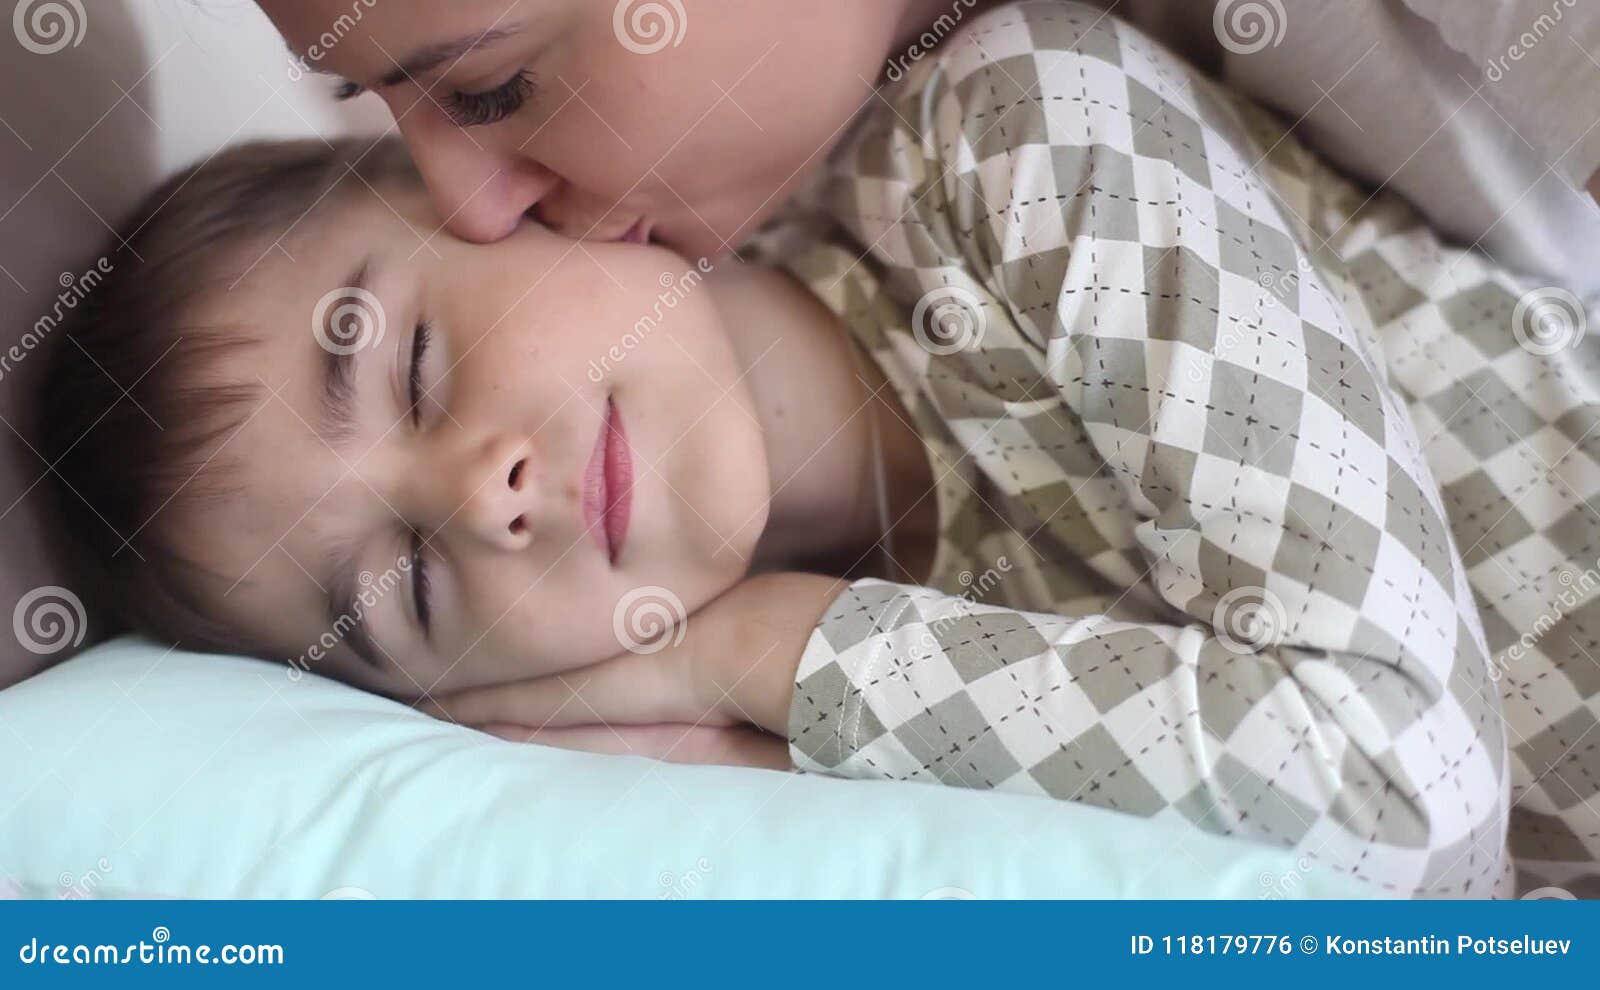 pakistani girla sex